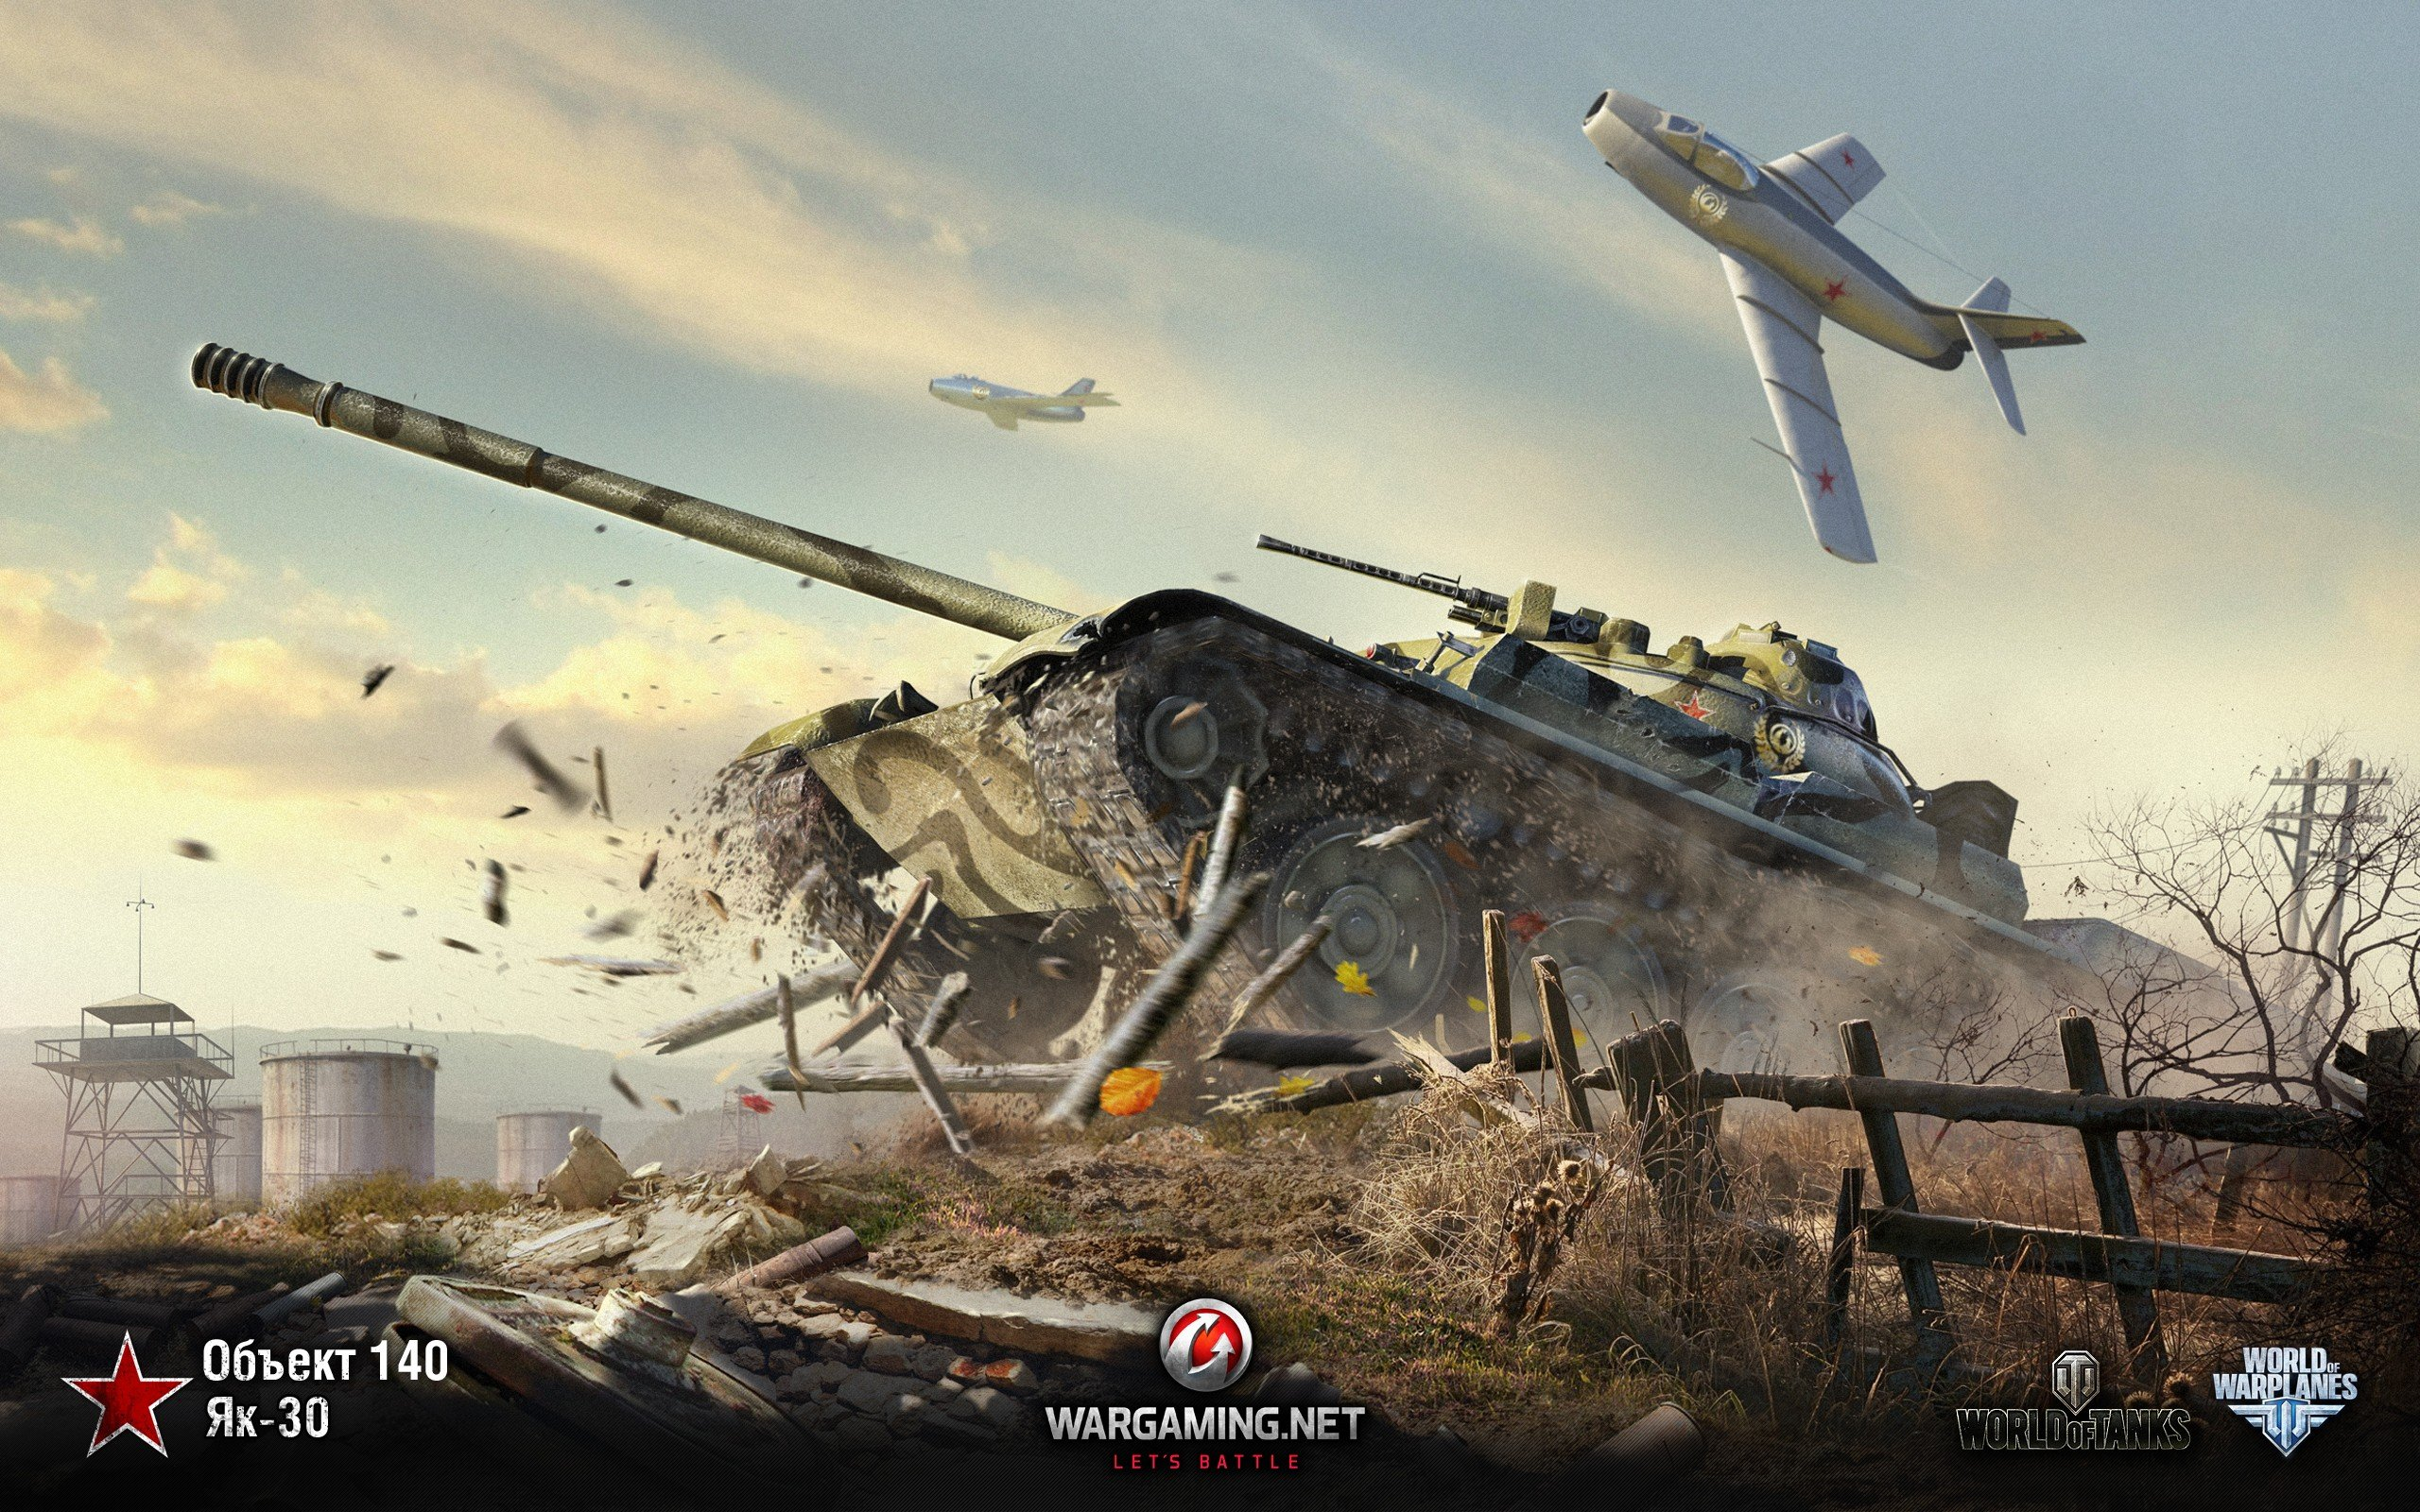 tank, World of Tanks, Obj. 140, Объект 140, Як 30, World of Warplanes, Wargaming Wallpaper